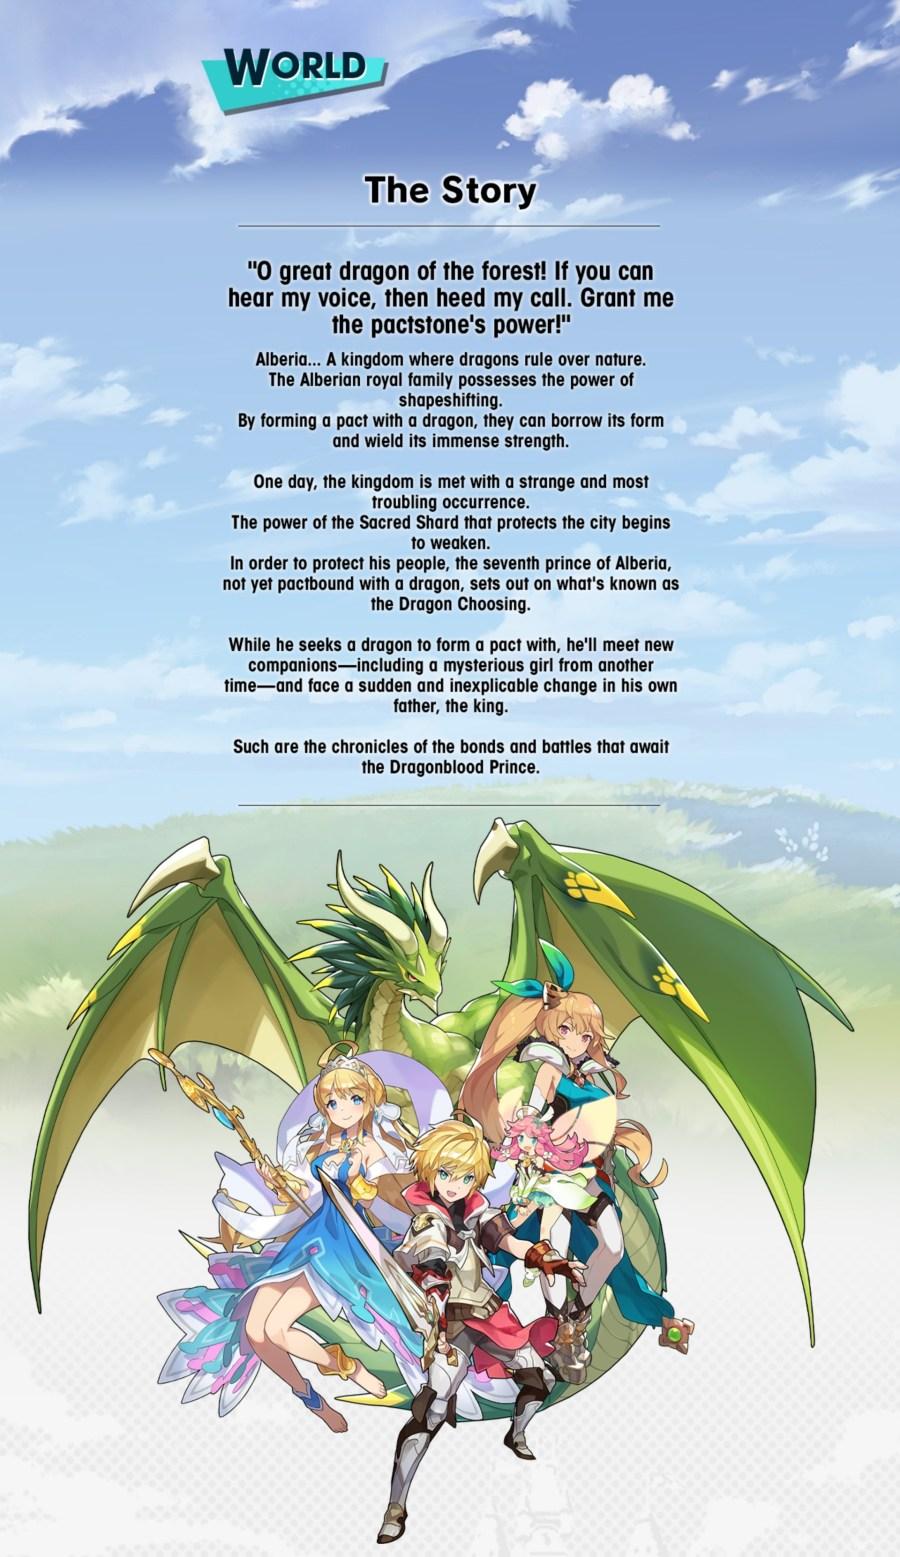 Dragalia Lost characters